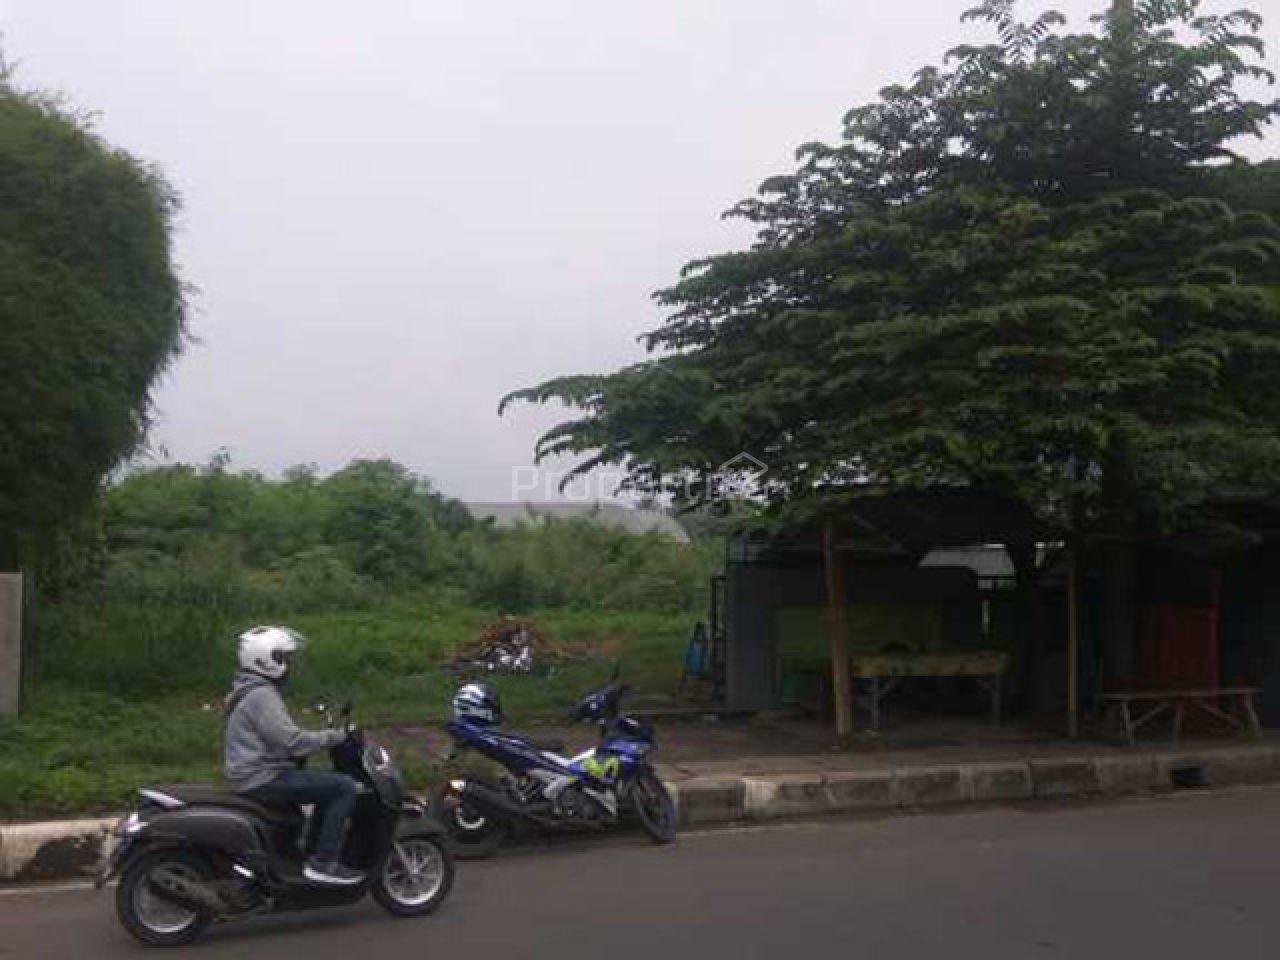 Commercial Land in Cibinong, Jawa Barat